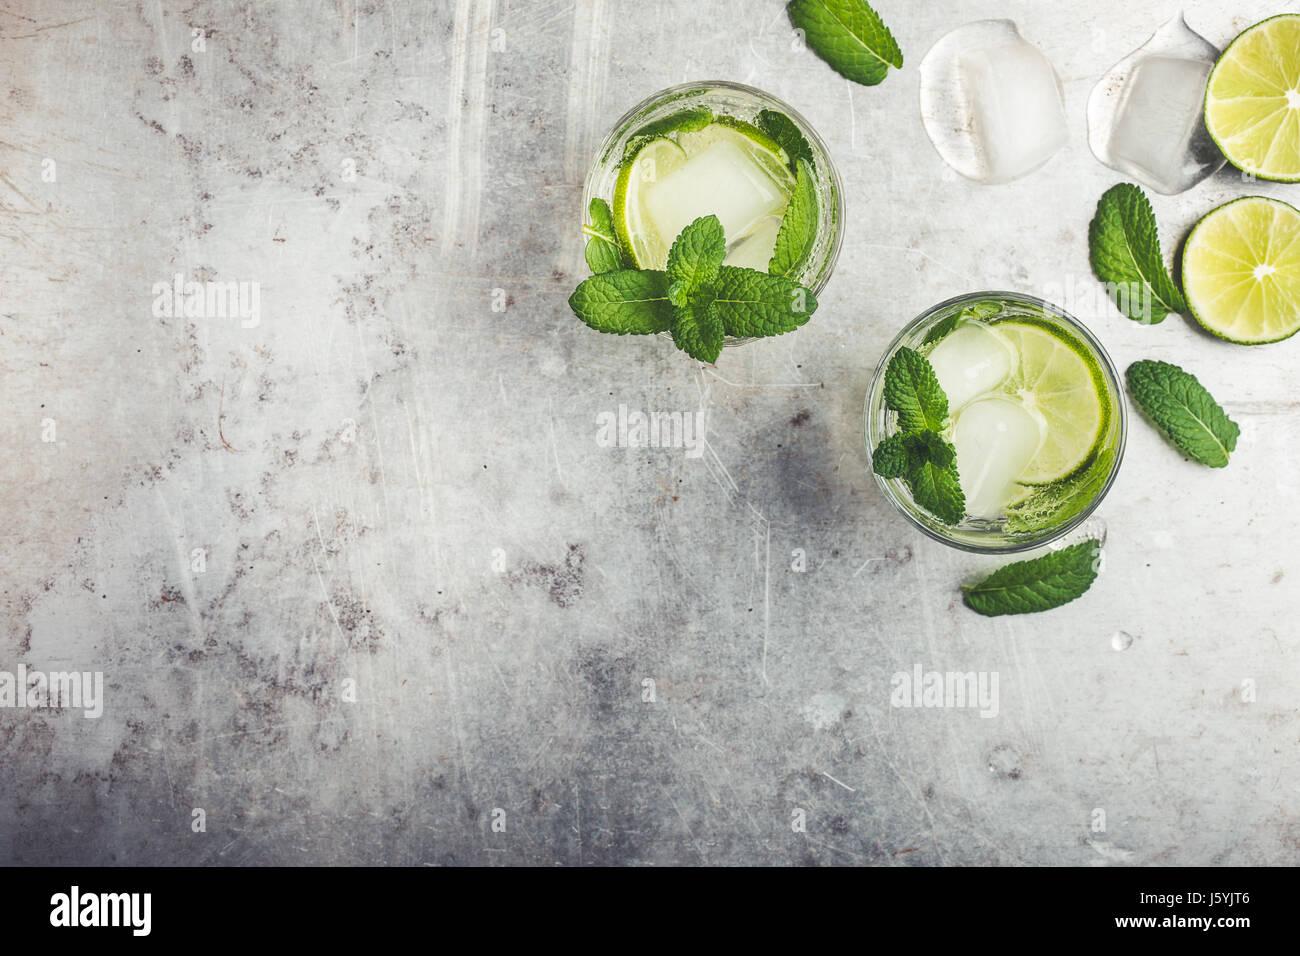 Cóctel Mojito sobre fondo gris claro con espacio para copiar texto o receta vistos desde arriba Foto de stock